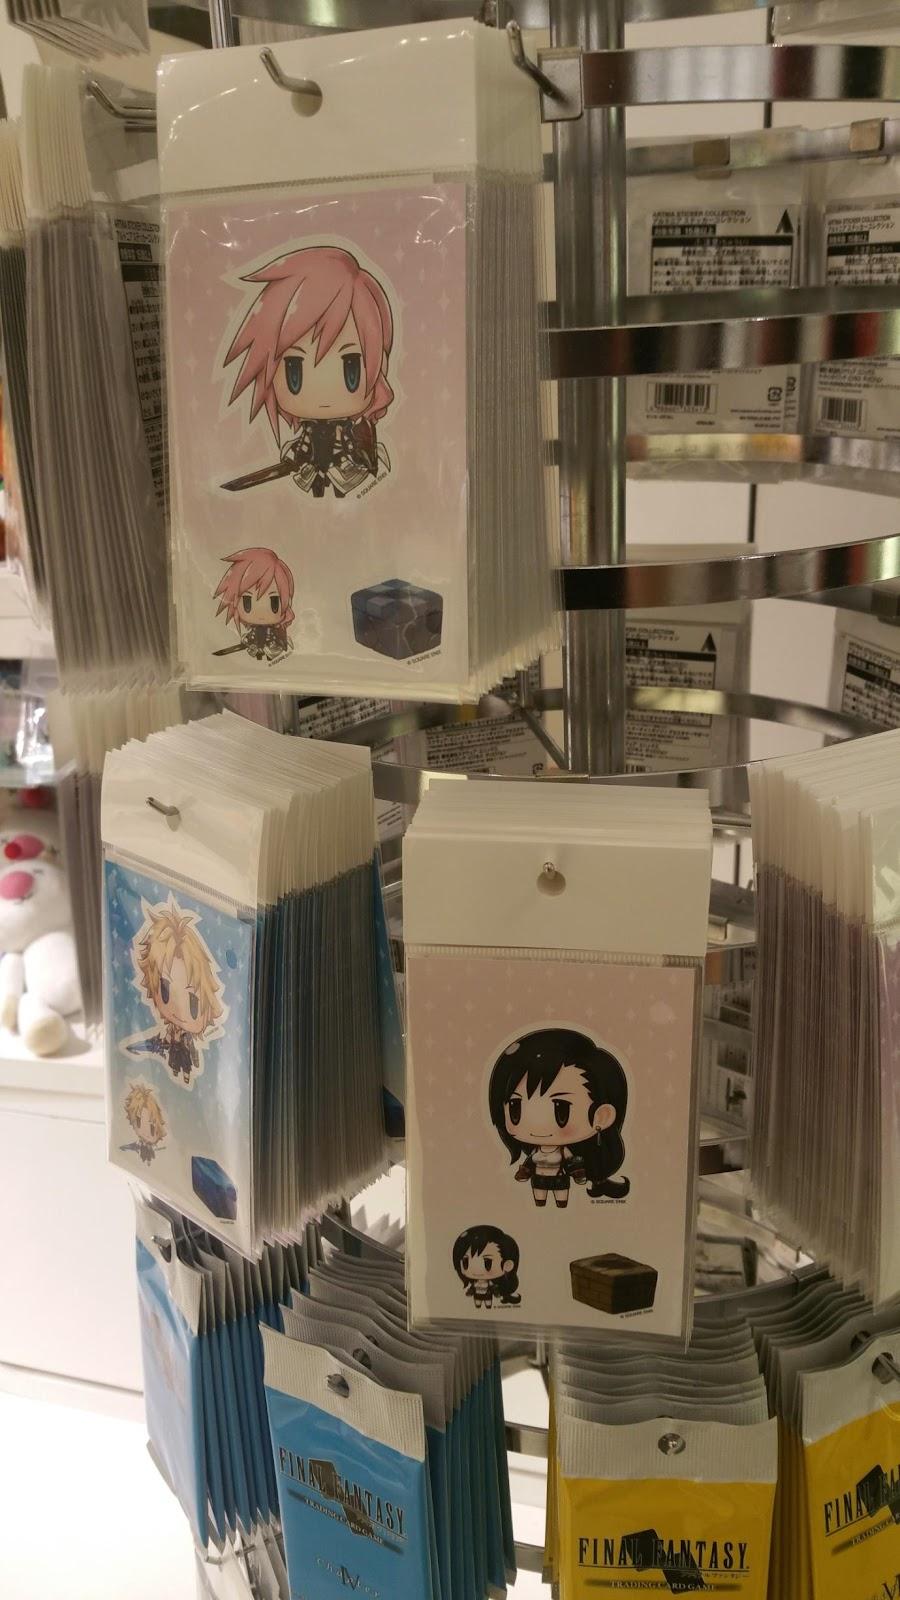 C:\Users\J\Pictures\TOKYO NOV 2016\ARTNIA\20161115_164103.jpg